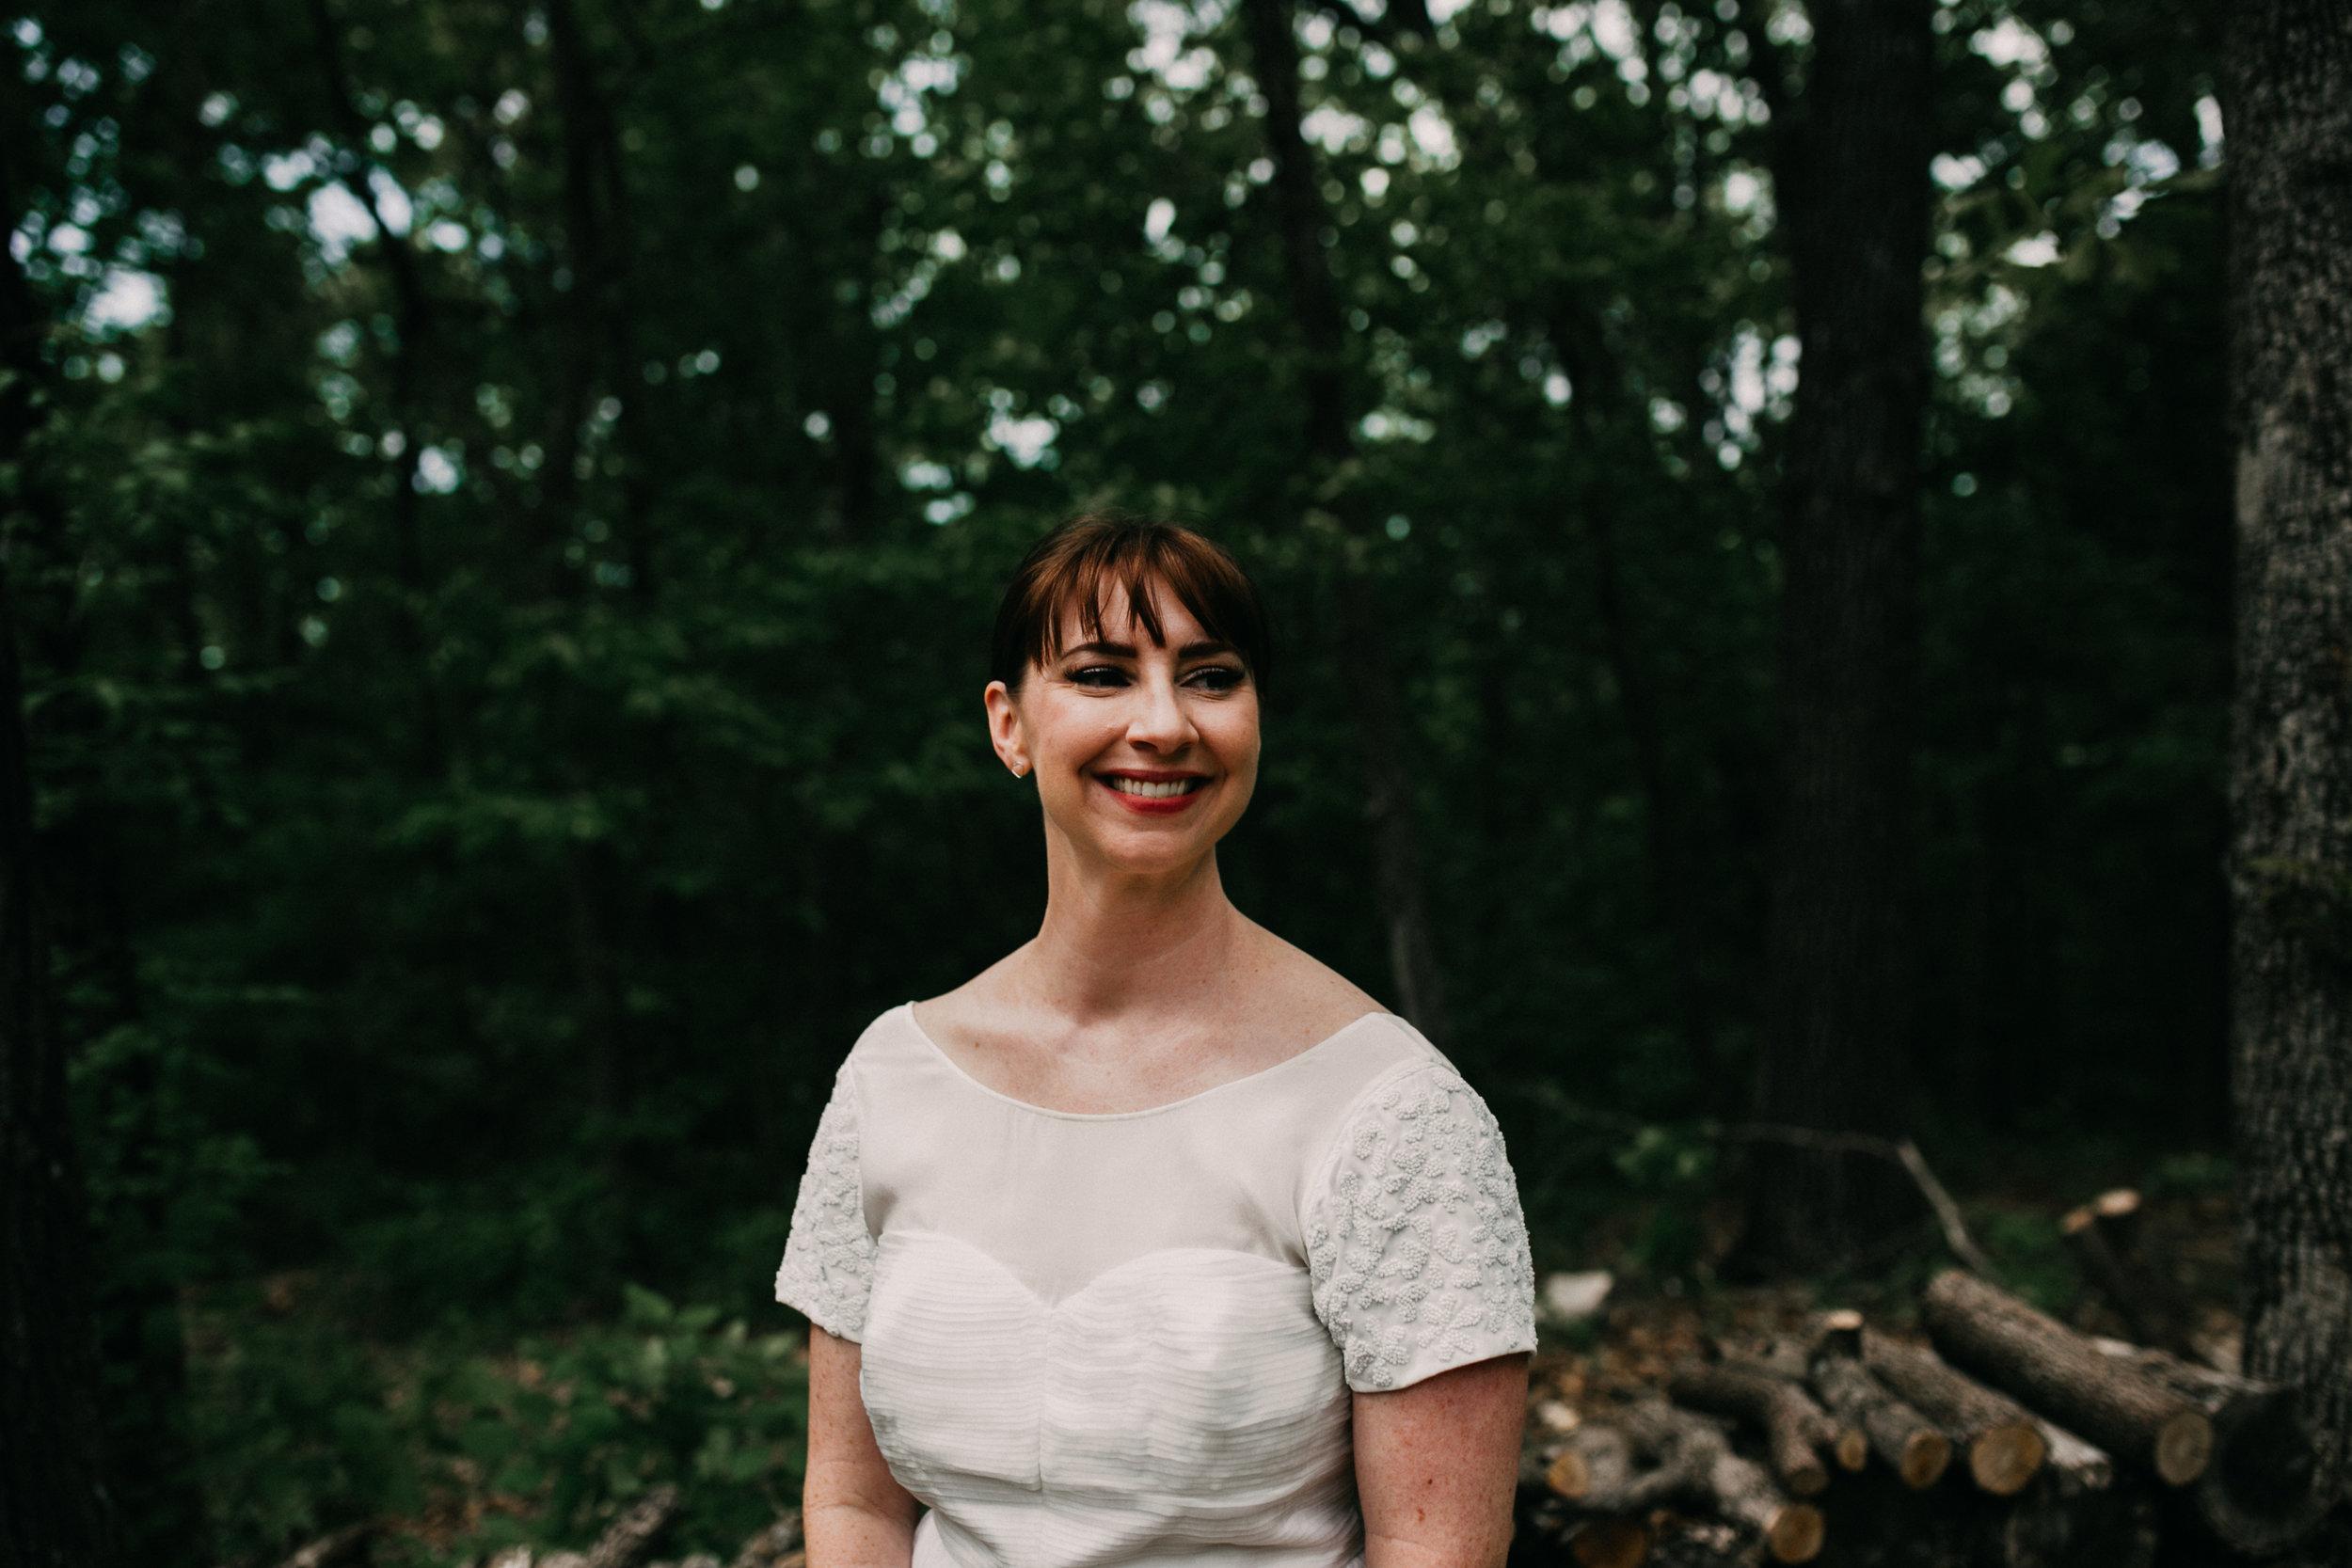 Midwest_Backyard_Wedding_MelaPhoto-0430.jpg